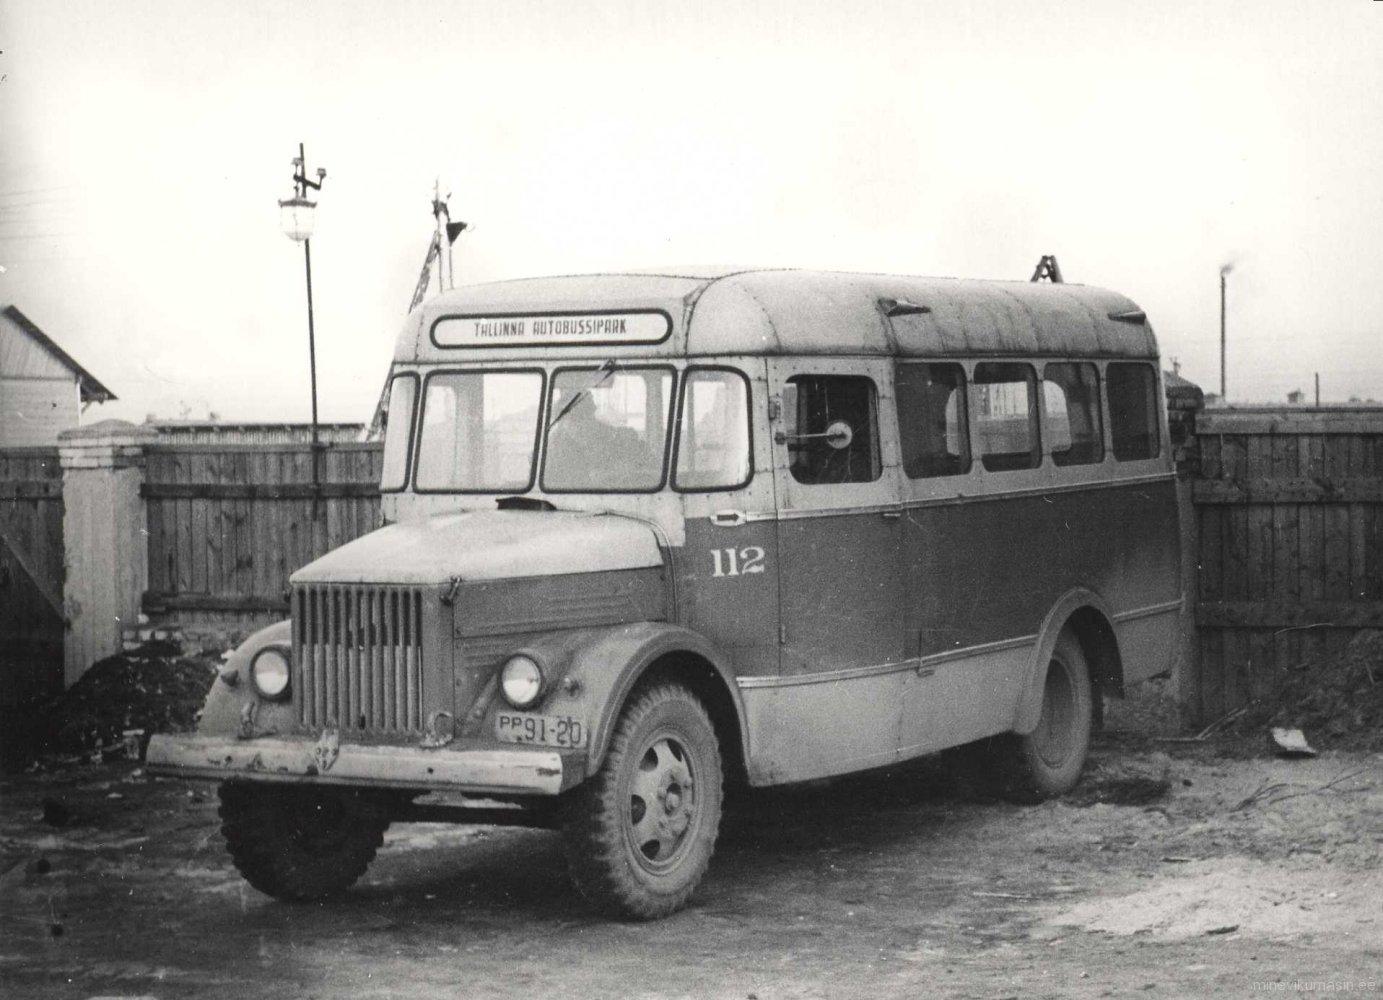 Tallinna Autobussipargi GZA-651 1959. a. riikliku reg. nr. PP 91-20, garaažinr 112.